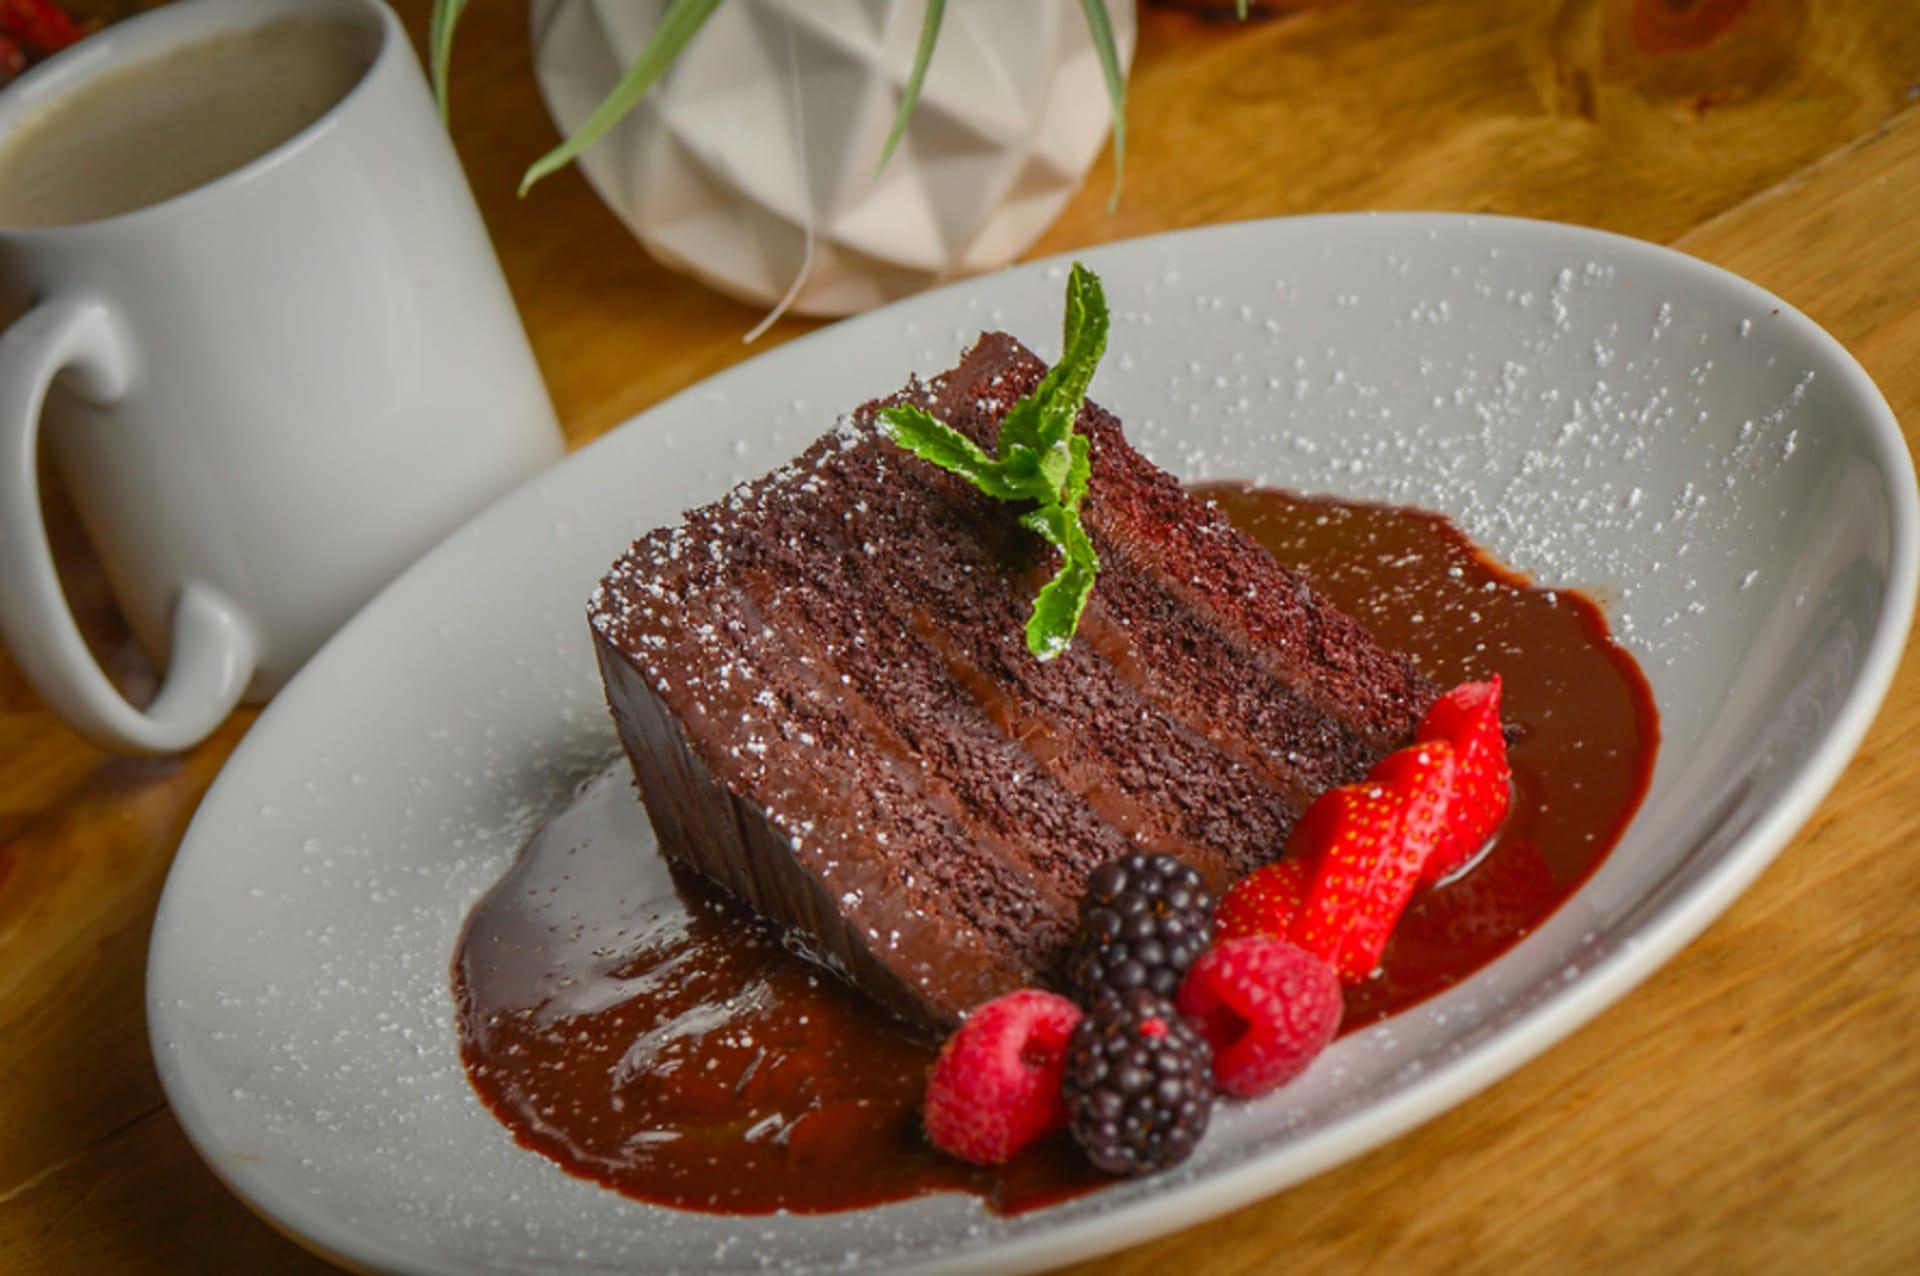 Abueleta Chocolate Cake